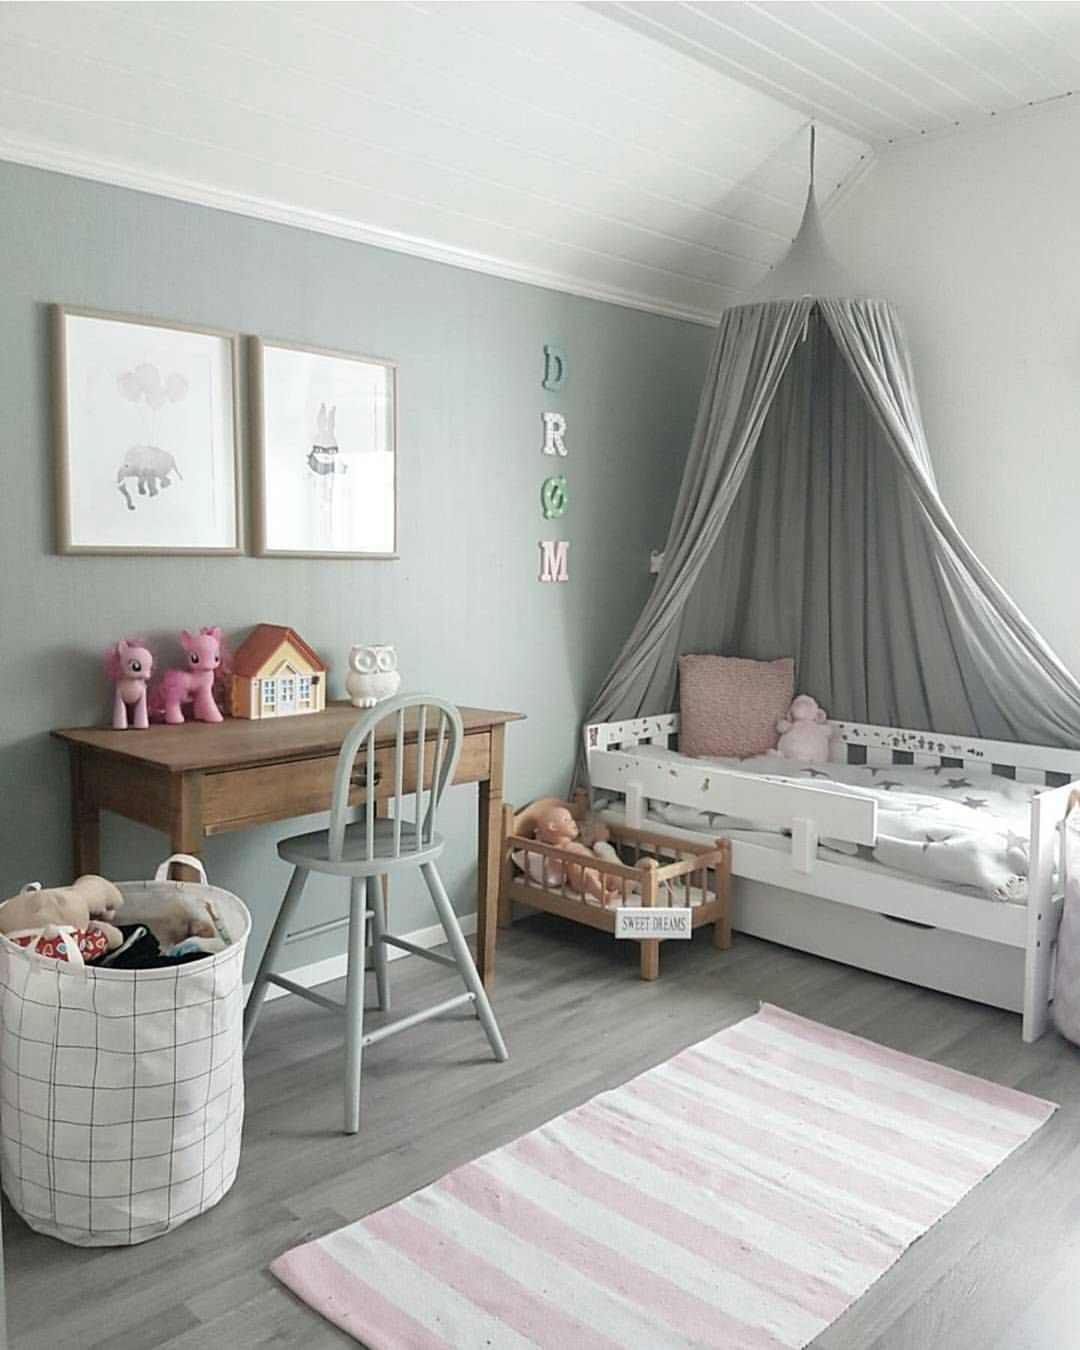 Child Room, Kids Room, Girls Bedroom, Girl Rooms, Grand Kids, Room  Decorations, Kid Stuff, Parenting, Bedrooms